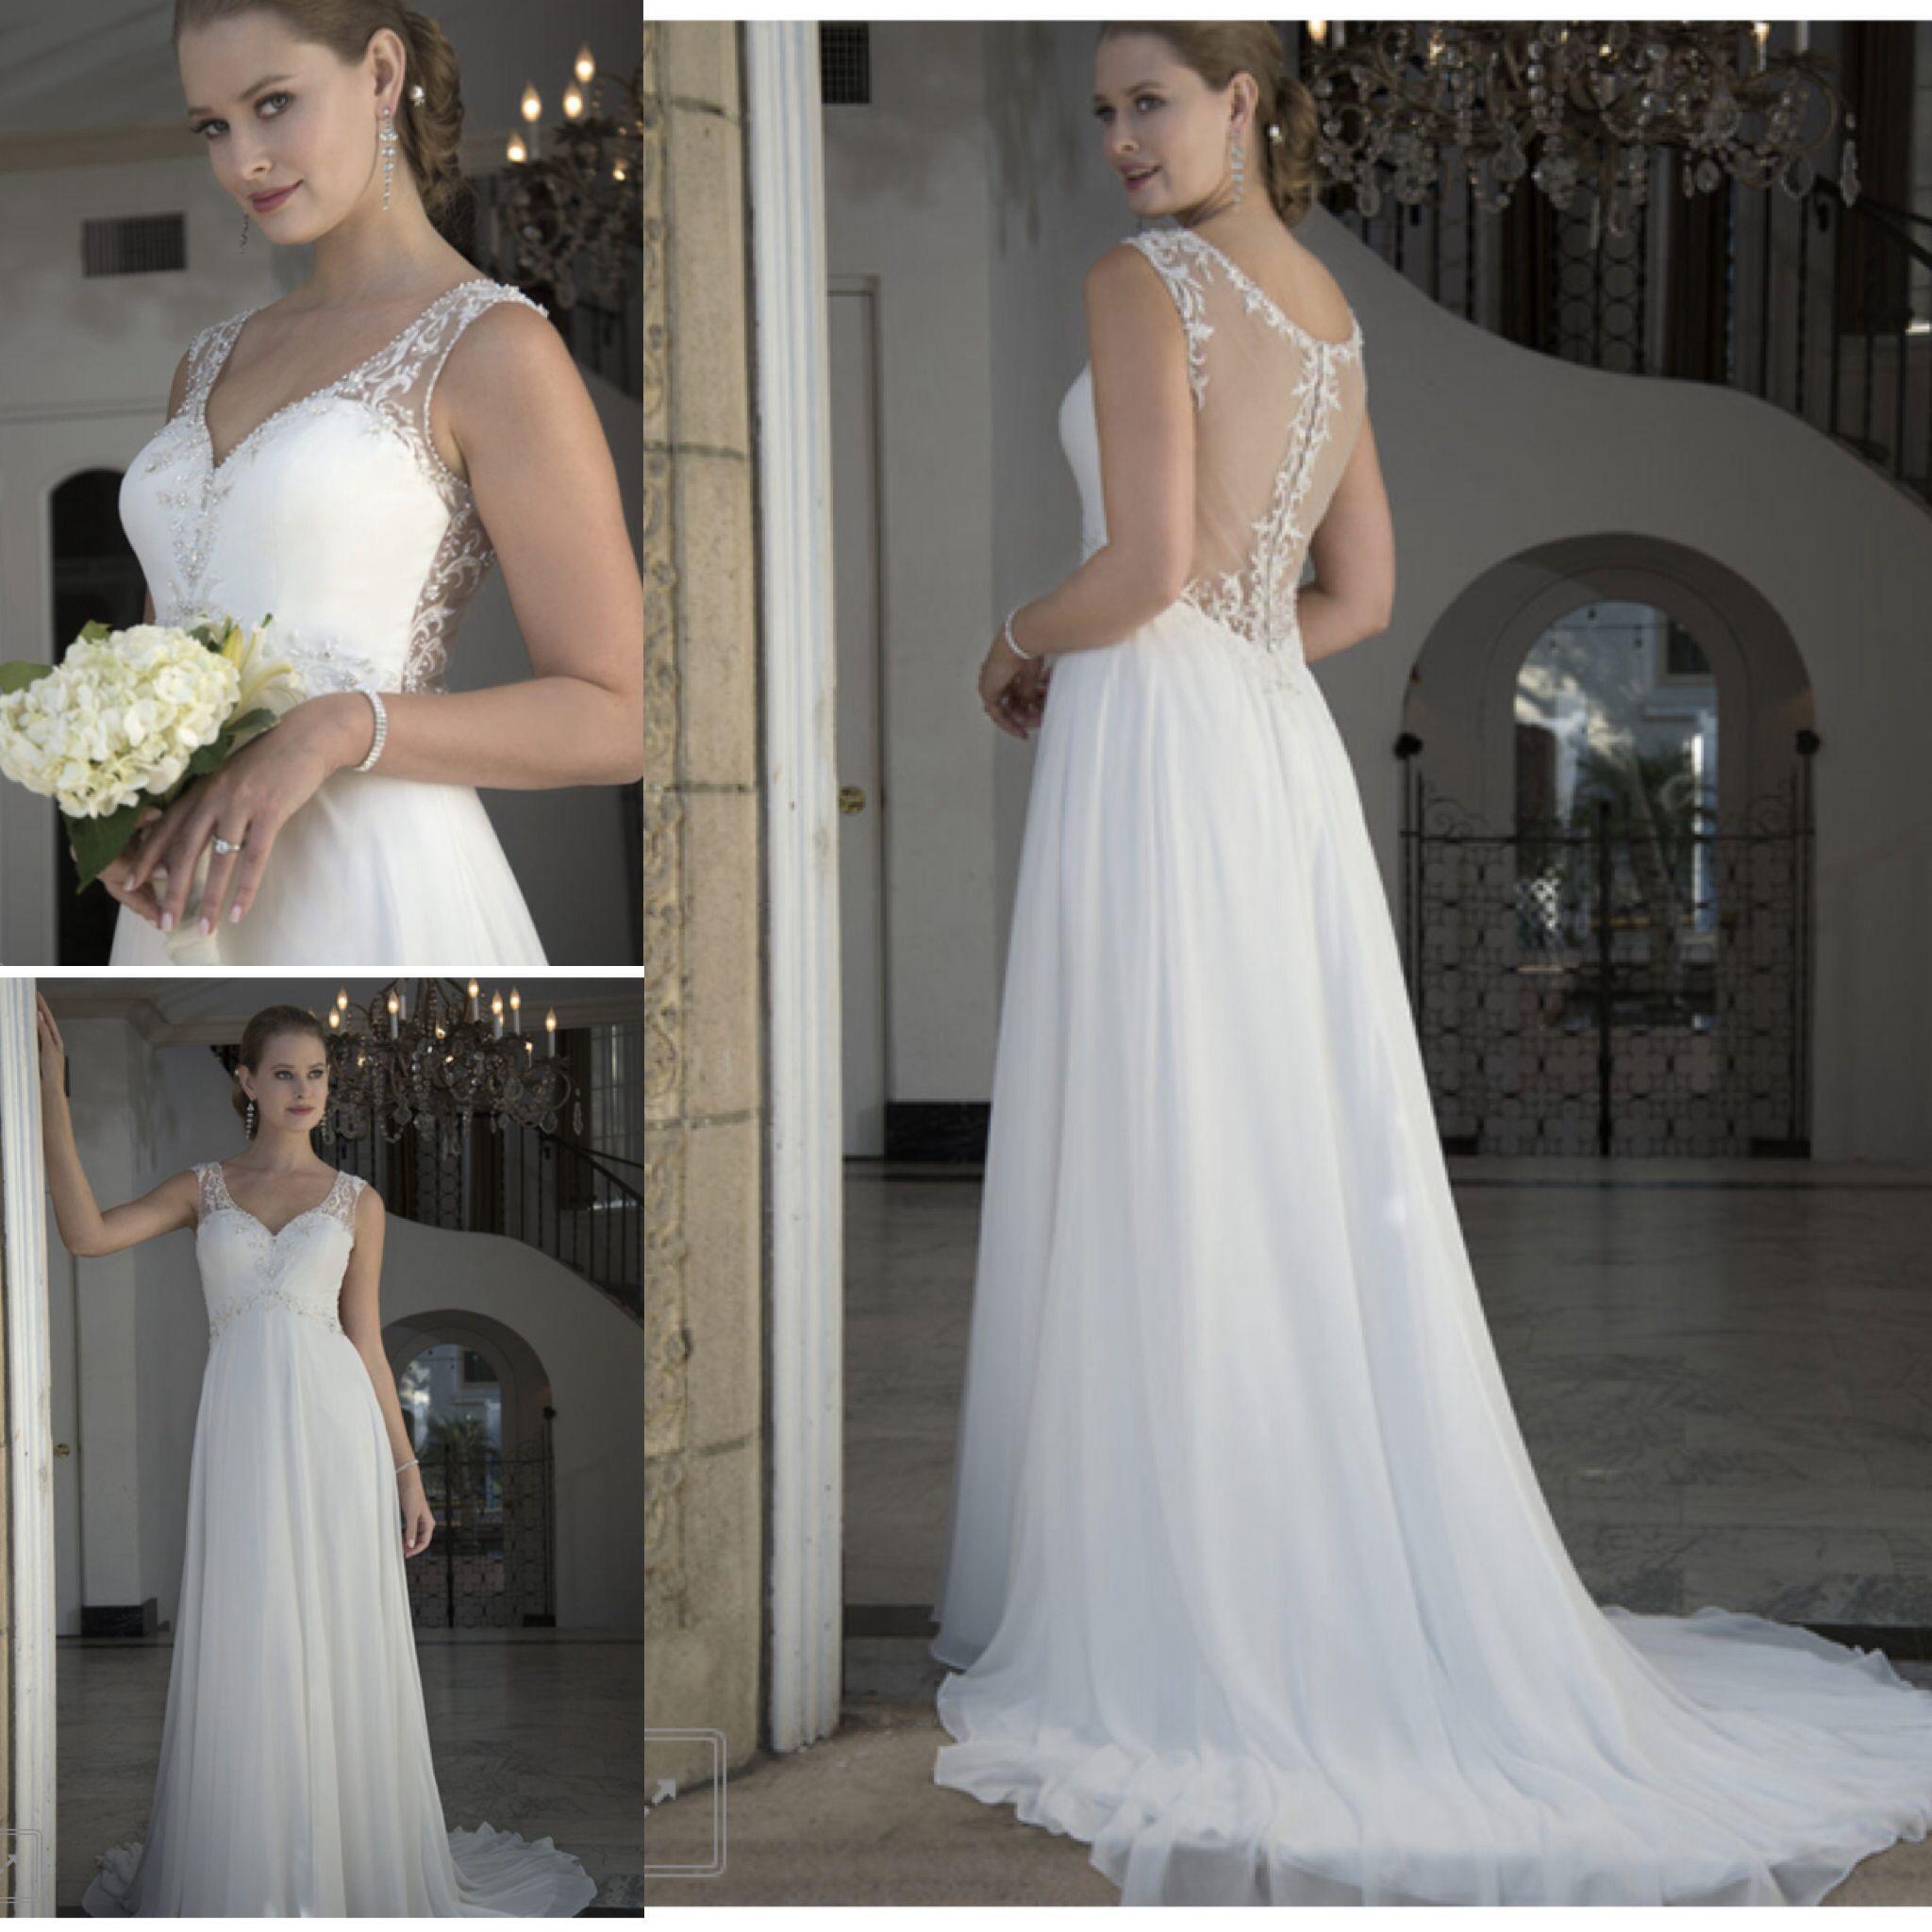 1b2cf45e5de Gorgeous back details on a soft and flowing empire gown. Venus Bridal style  6642